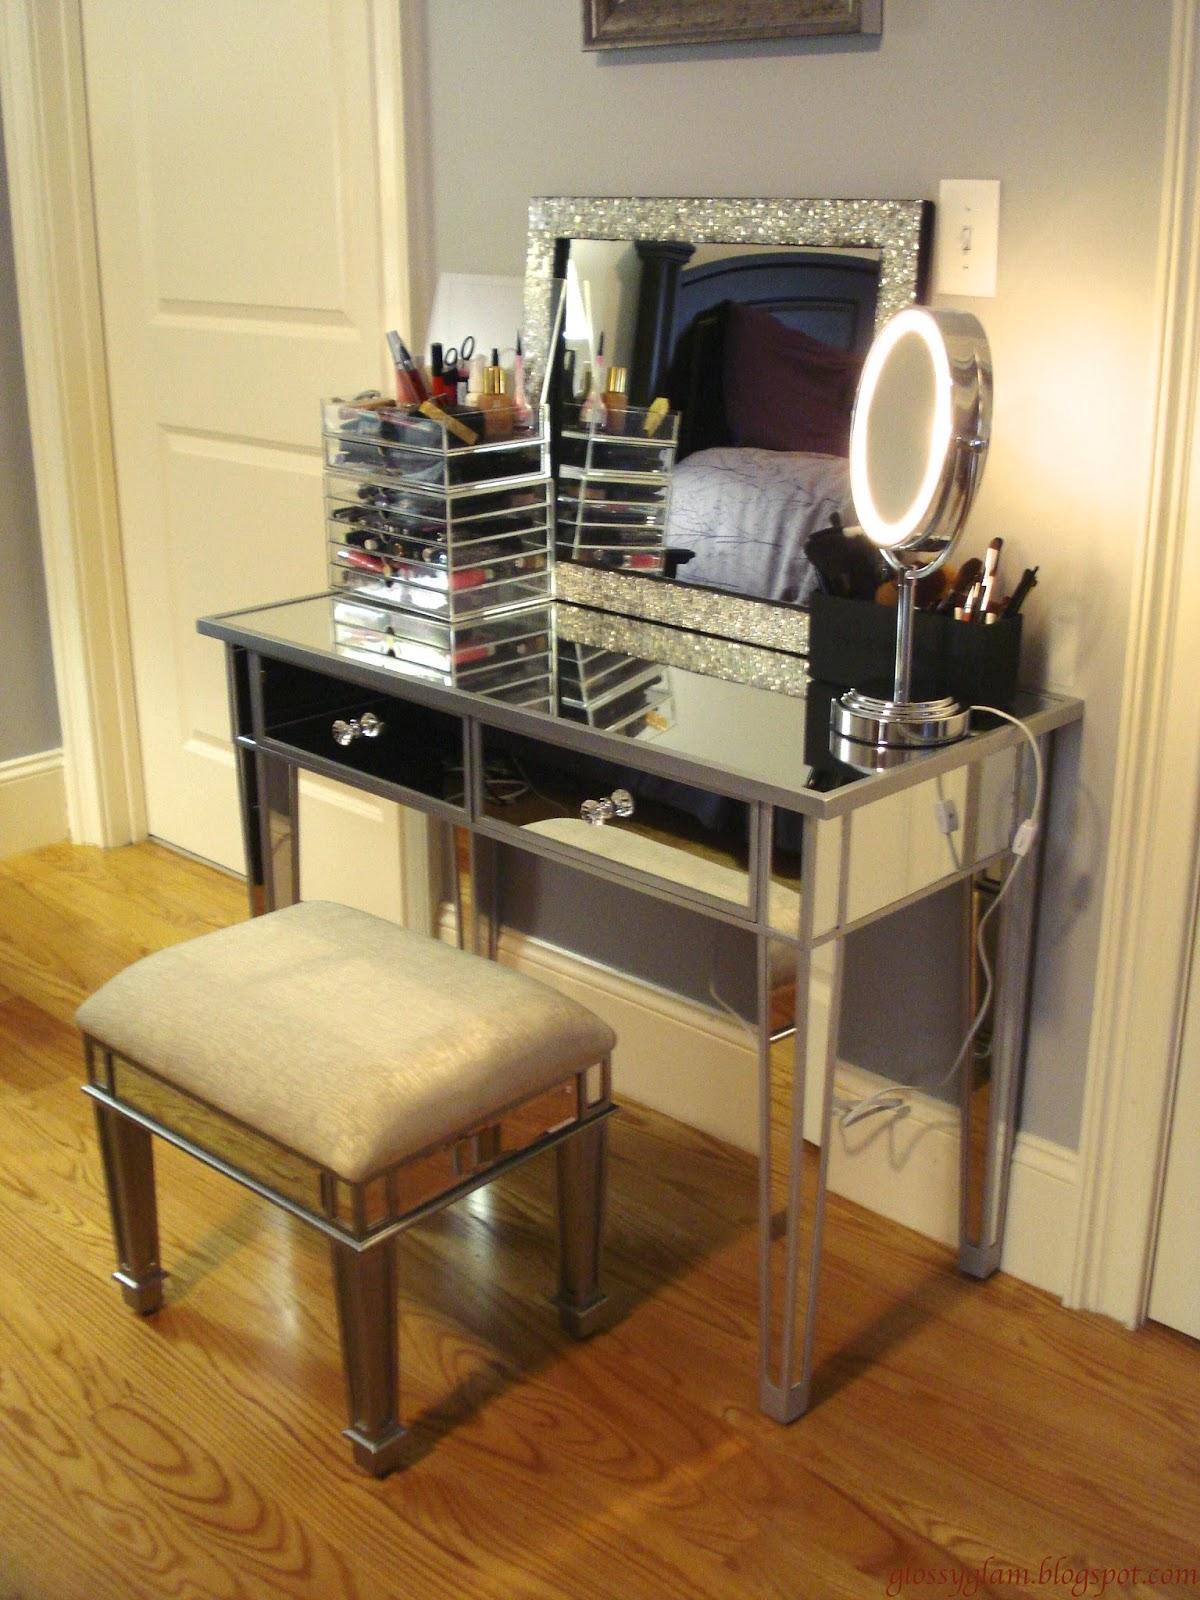 hayworth mirrored furniture. Hayworth Mirrored Vanity Knockoff Furniture